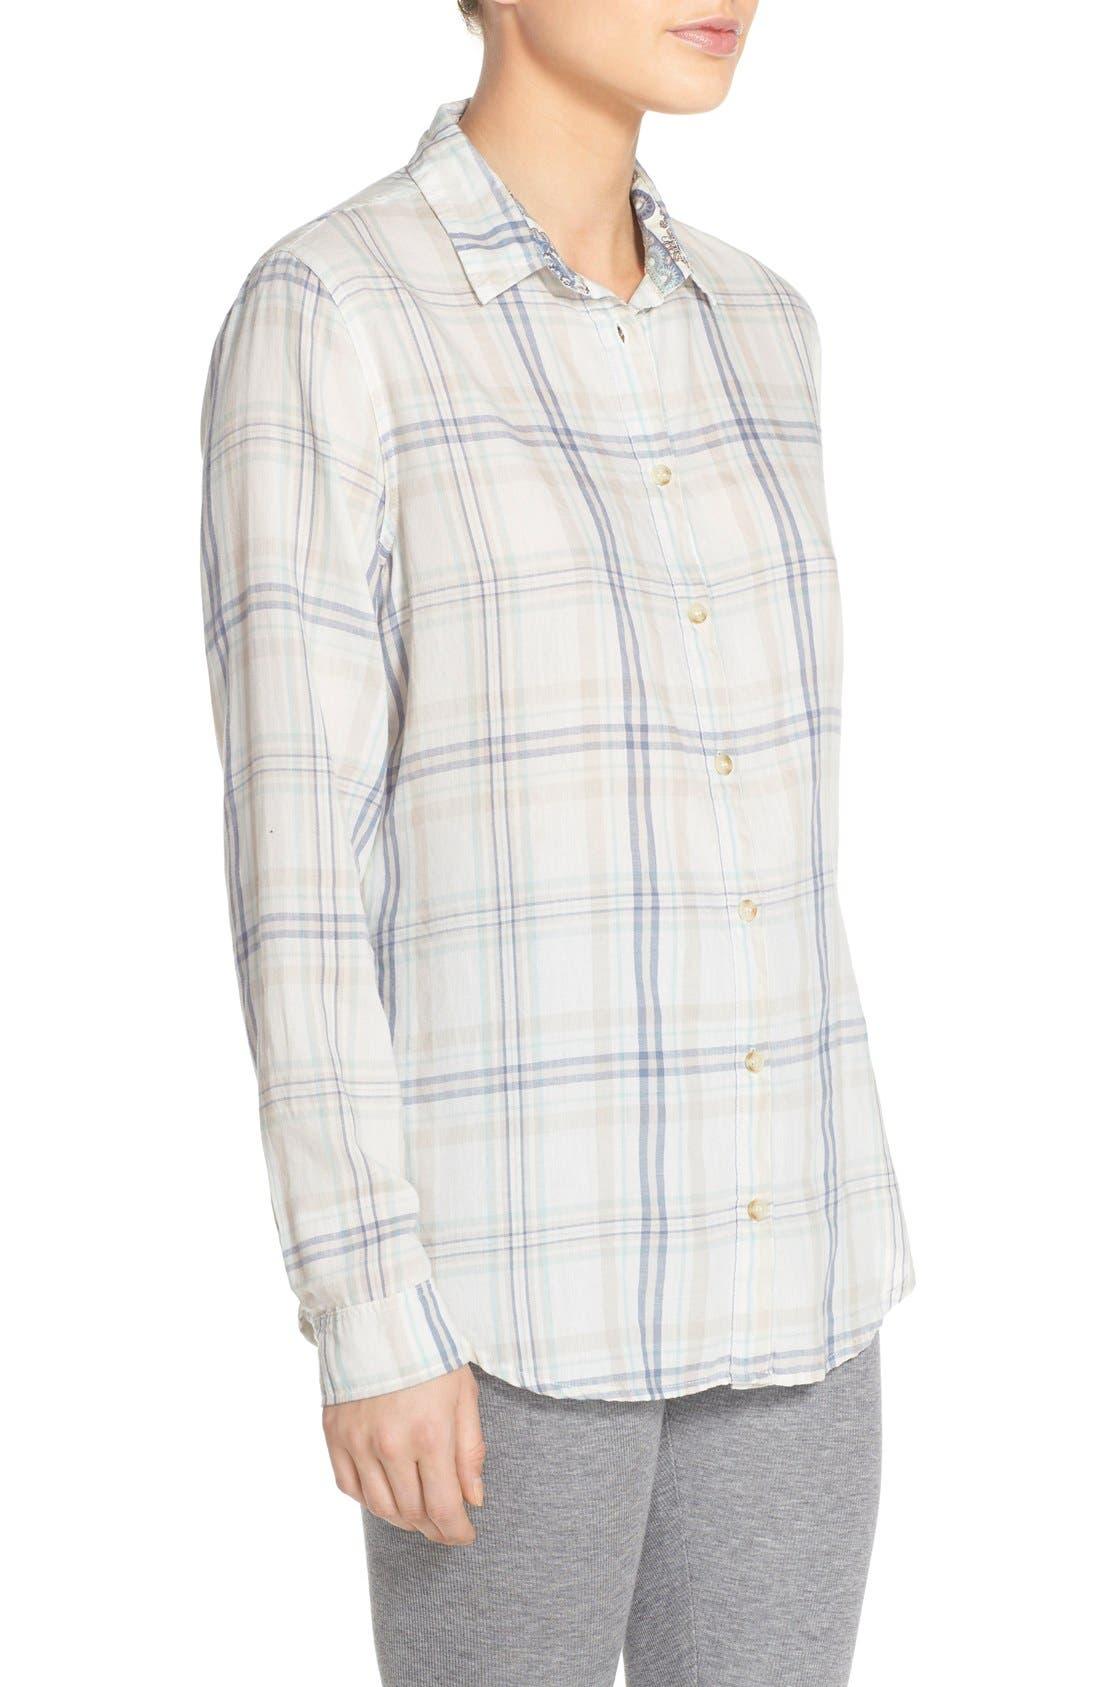 Alternate Image 3  - PJ Salvage Plaid Cotton Twill Shirt